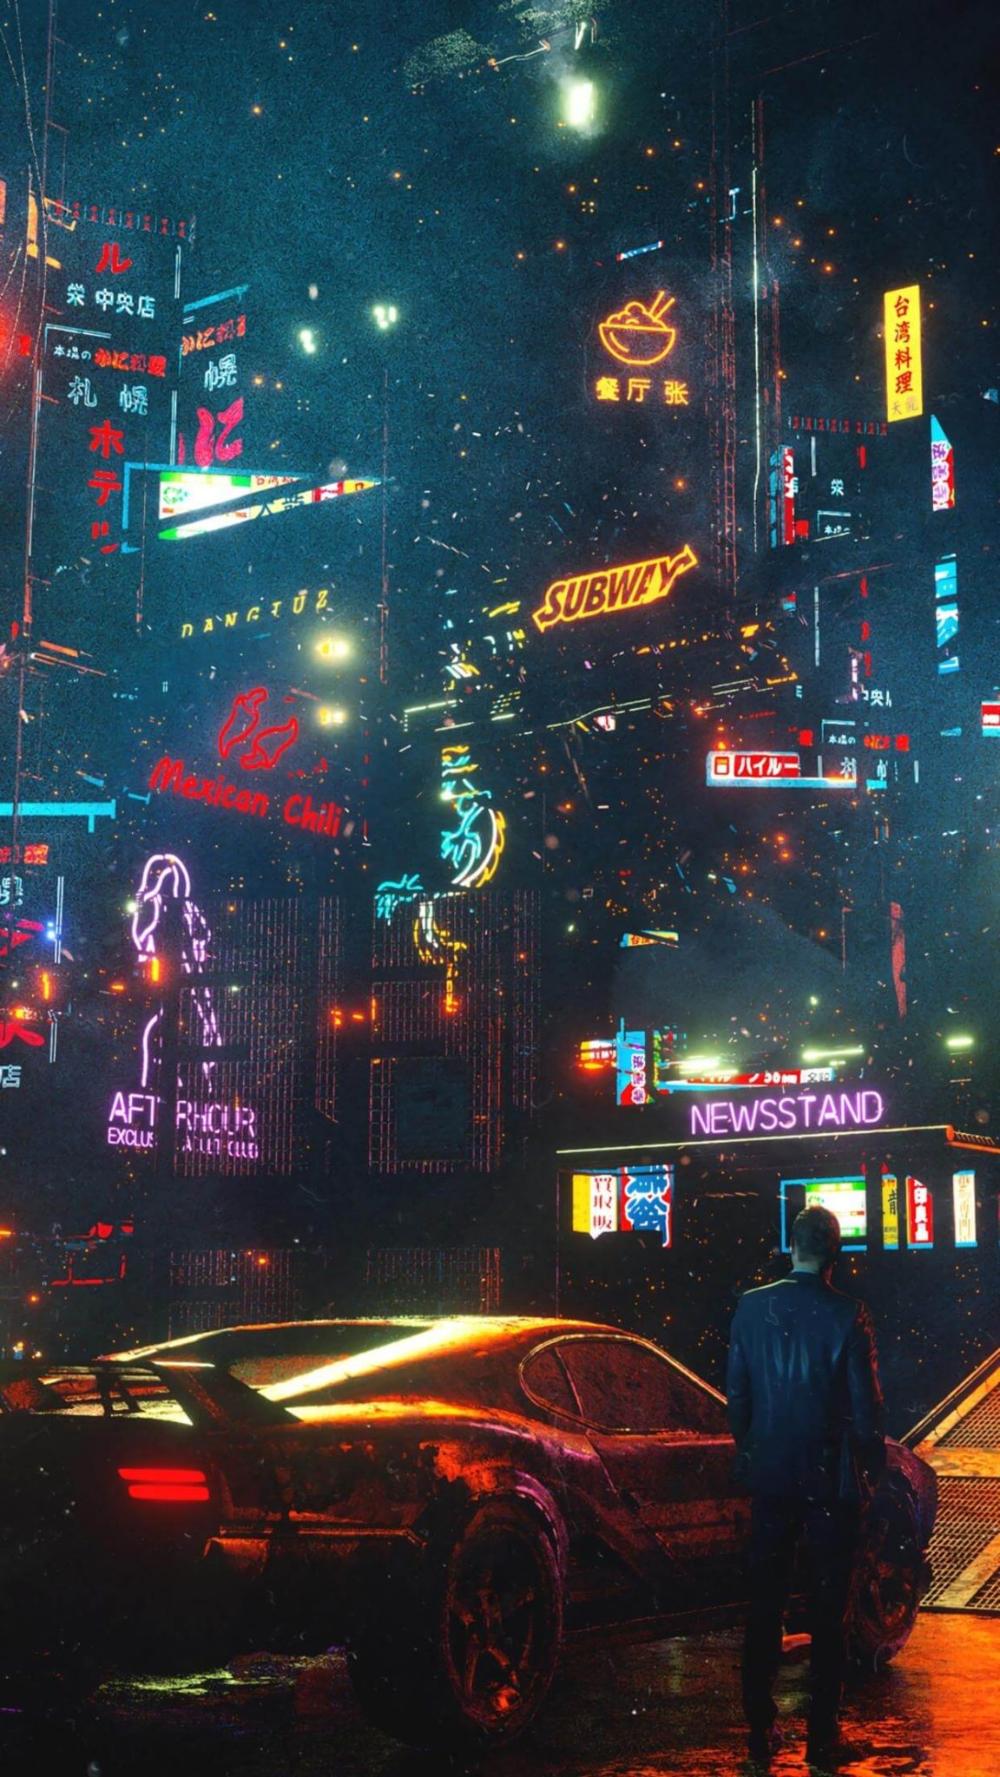 Cyberpunk Art Hd Phone Wallpapers Cyberpunk Aesthetic Cyberpunk Art Cyberpunk City